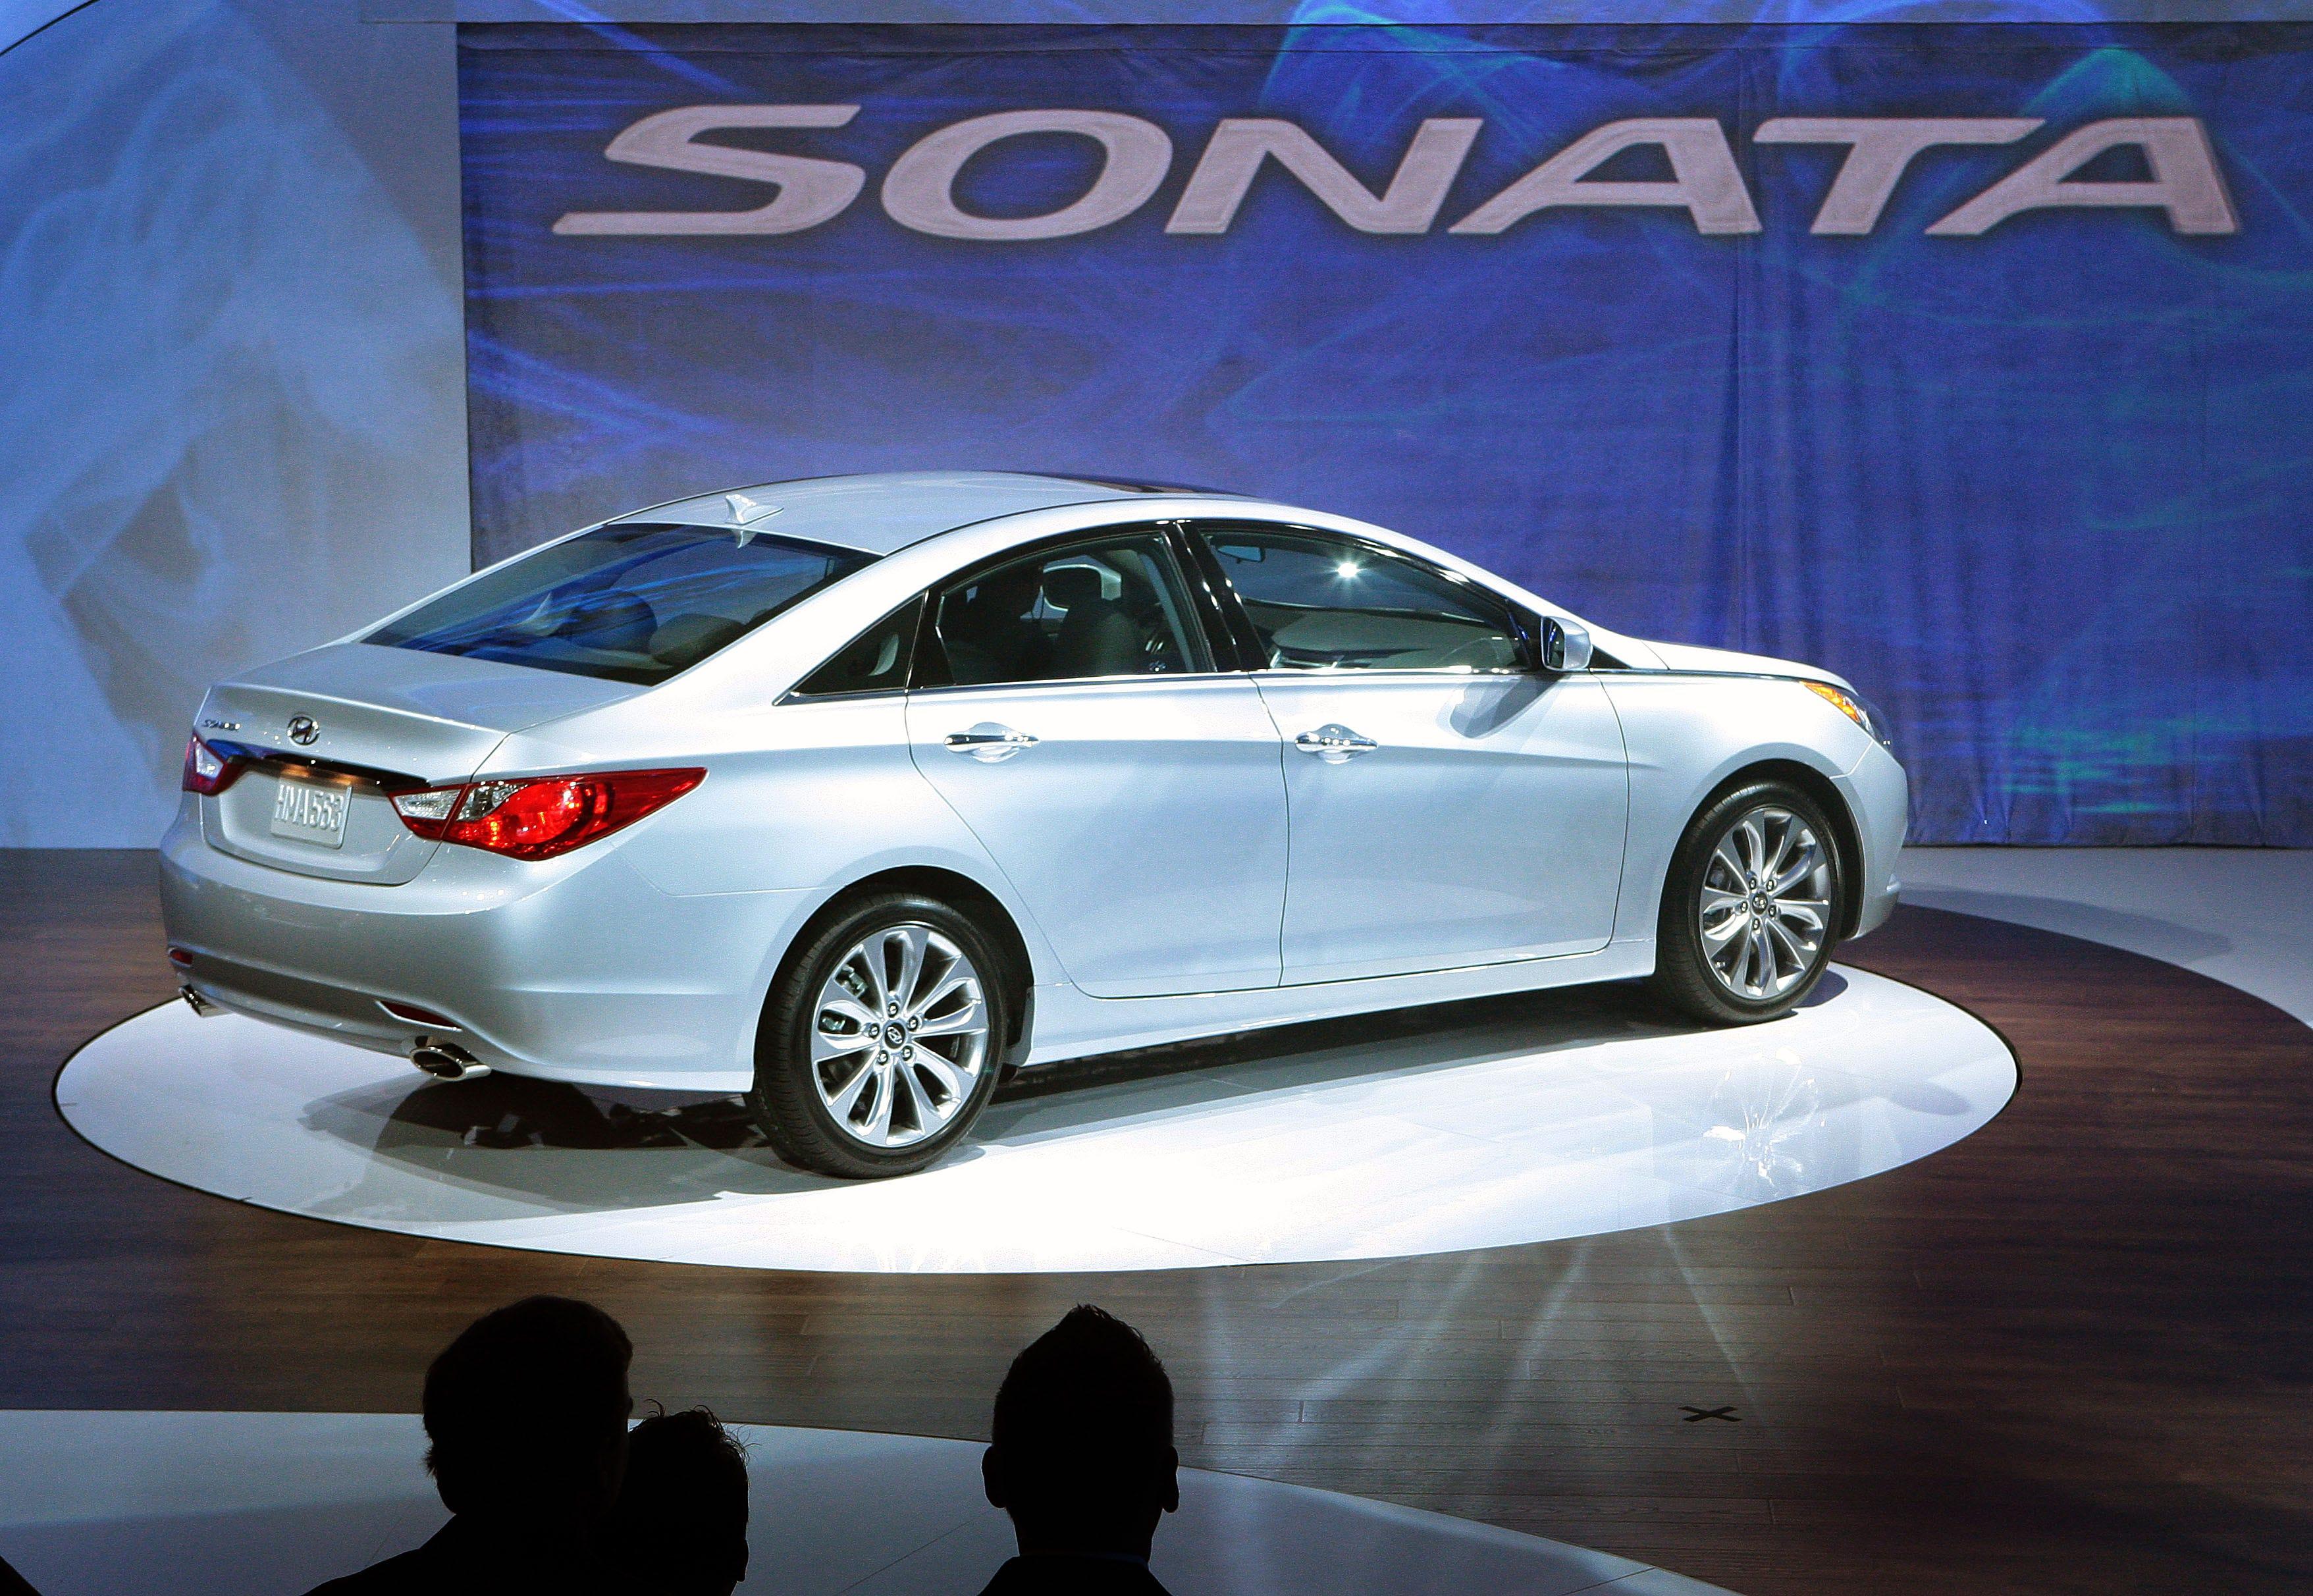 635787753550602614 XXX Hyundai 2011 Sonata 2 hyundai recalls 470,000 sonatas to fix engine problem